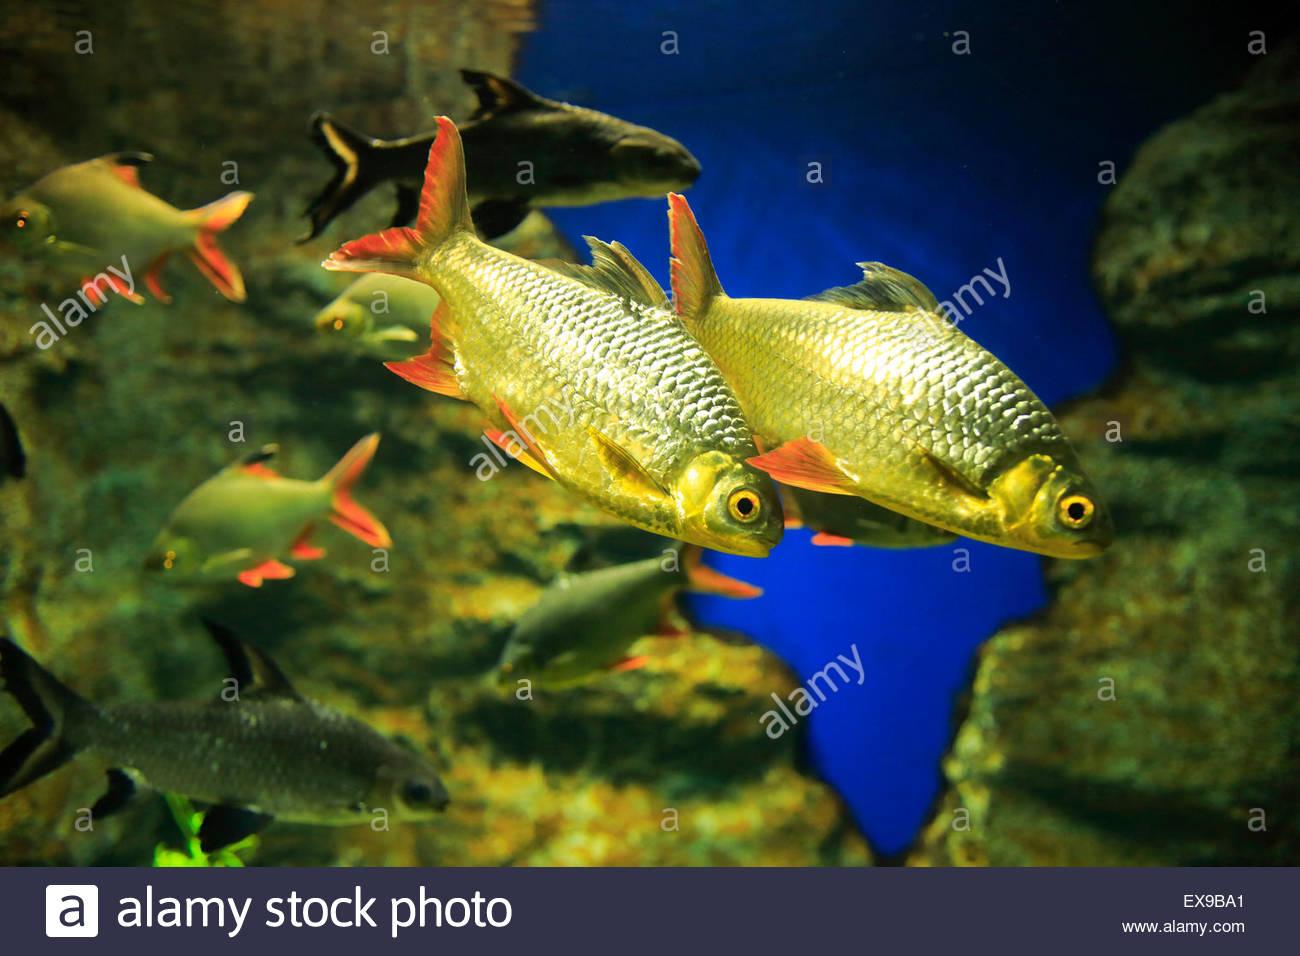 Fish aquarium japan - Japan Hokkaido Kitami Redfin Fusilier Fish Swimming In Aquarium Close Up